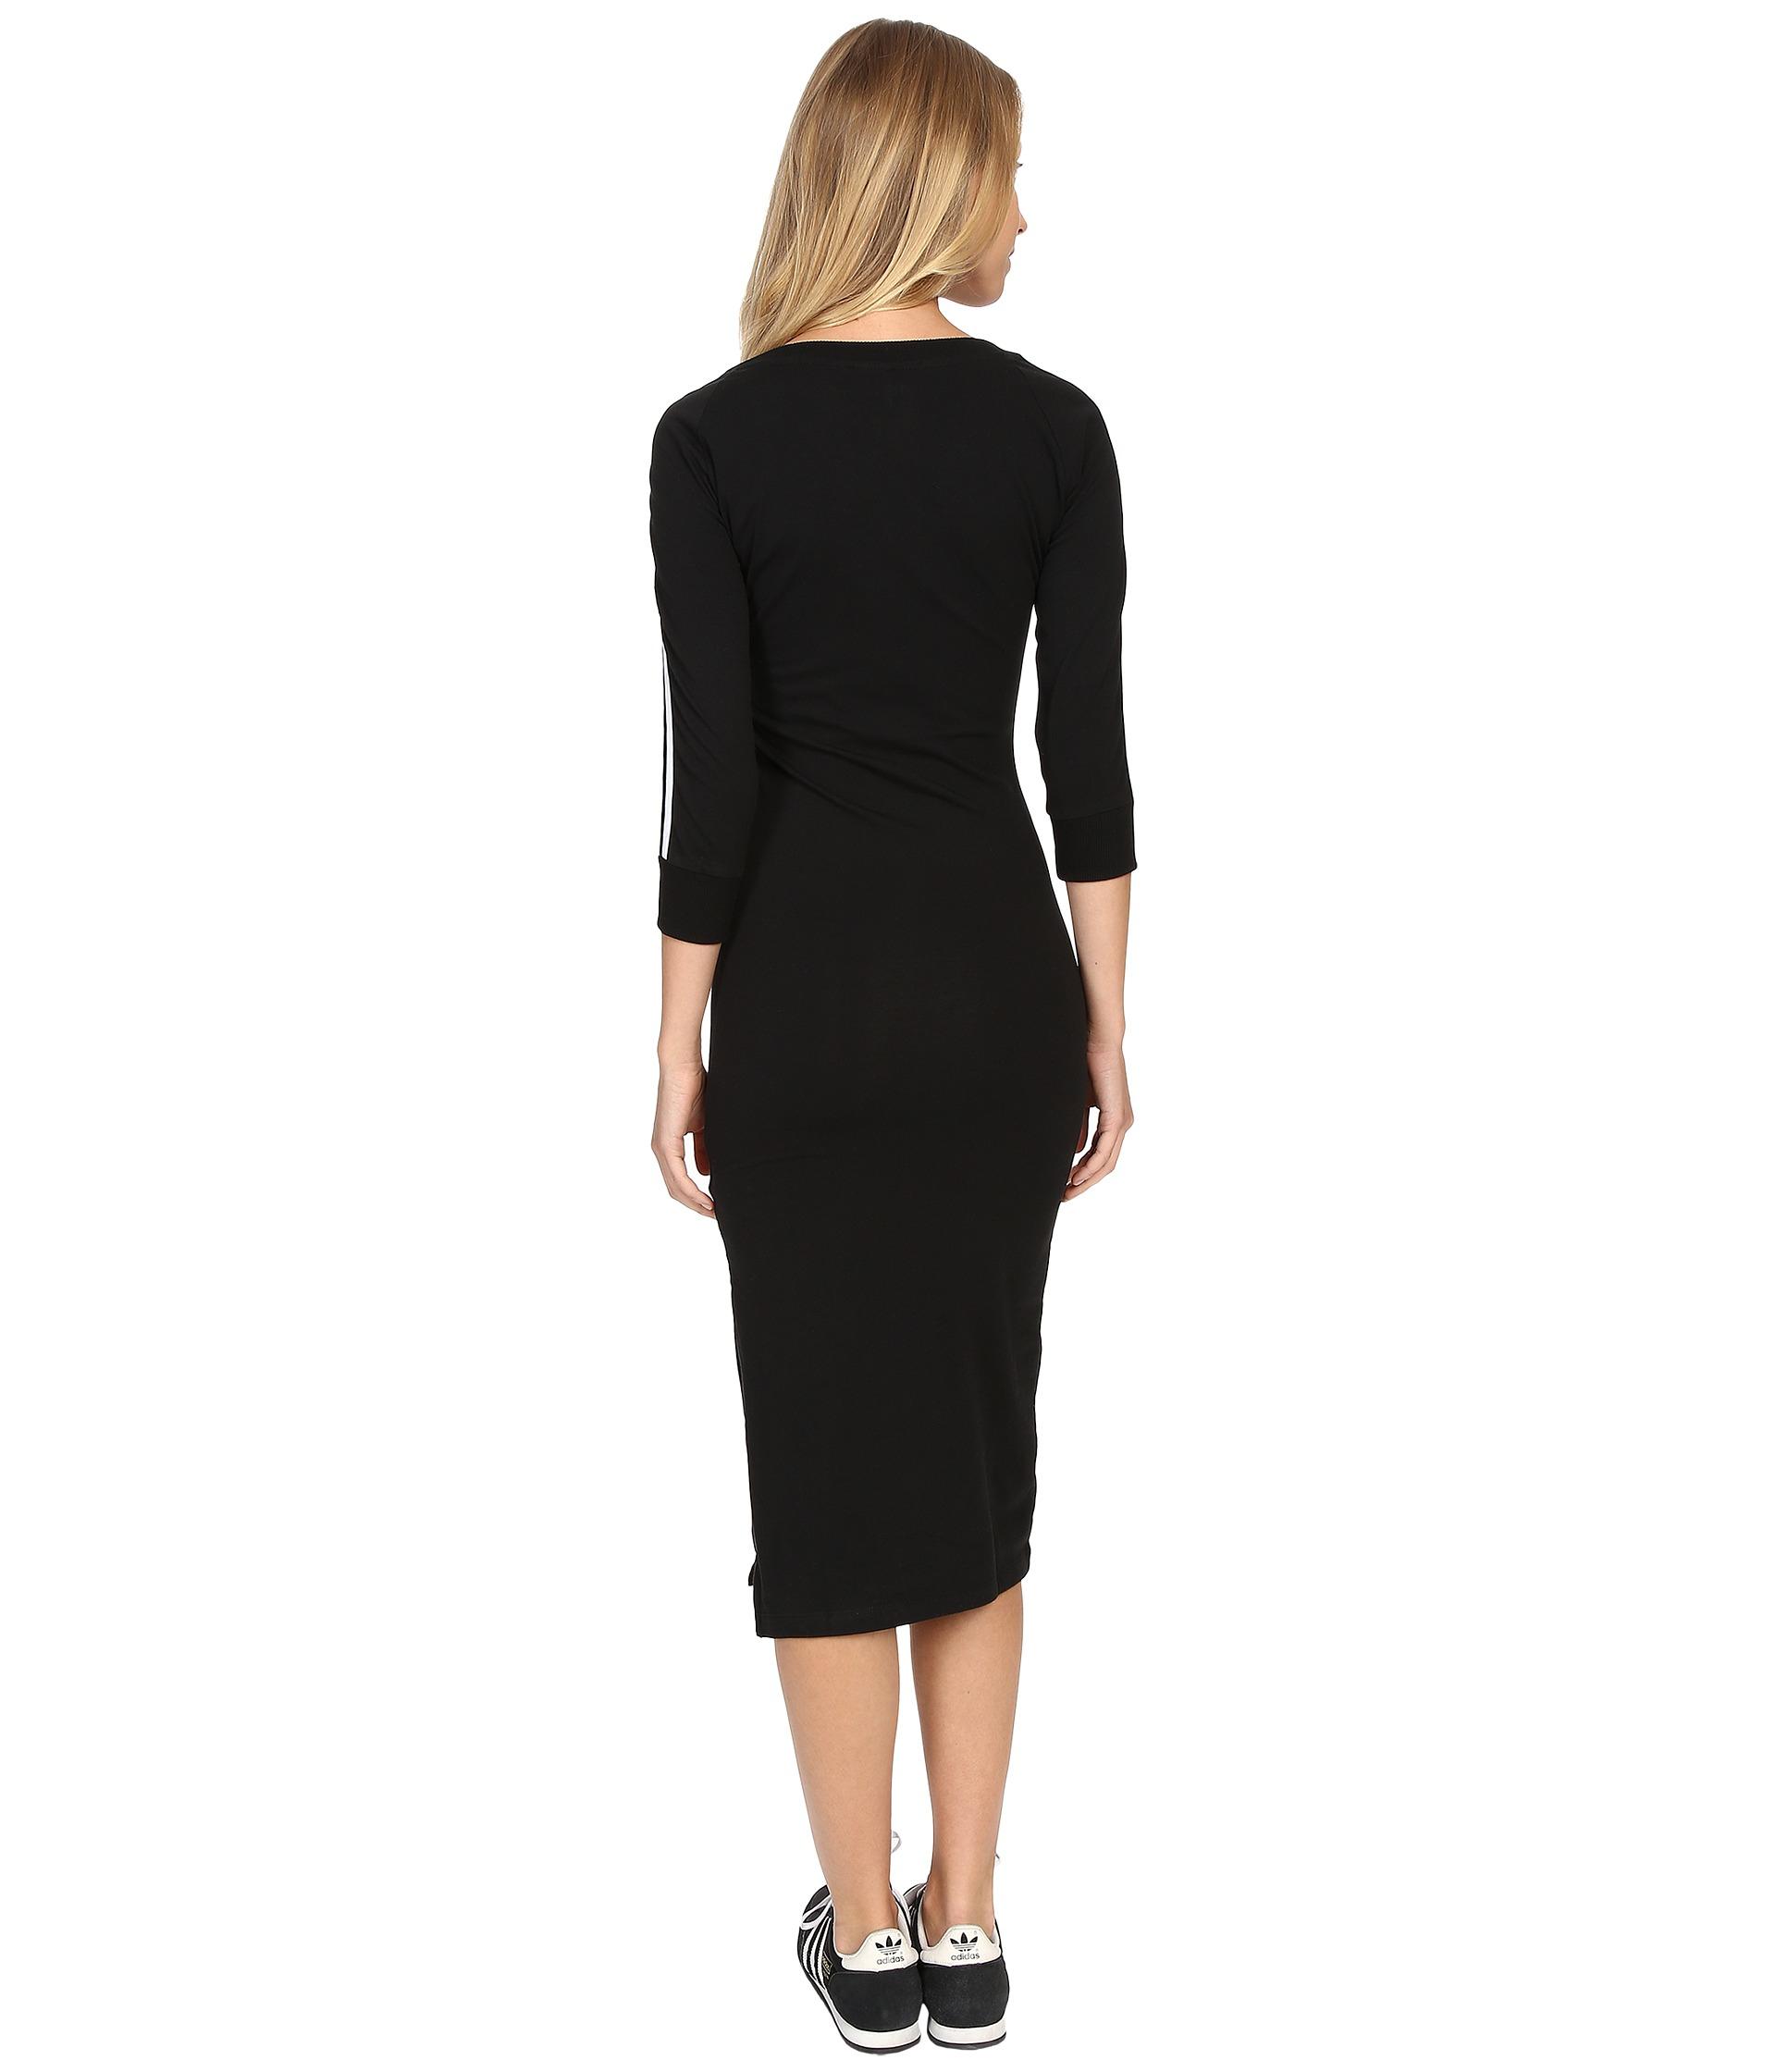 Lyst Adidas Originals 3 Stripes Dress In Black